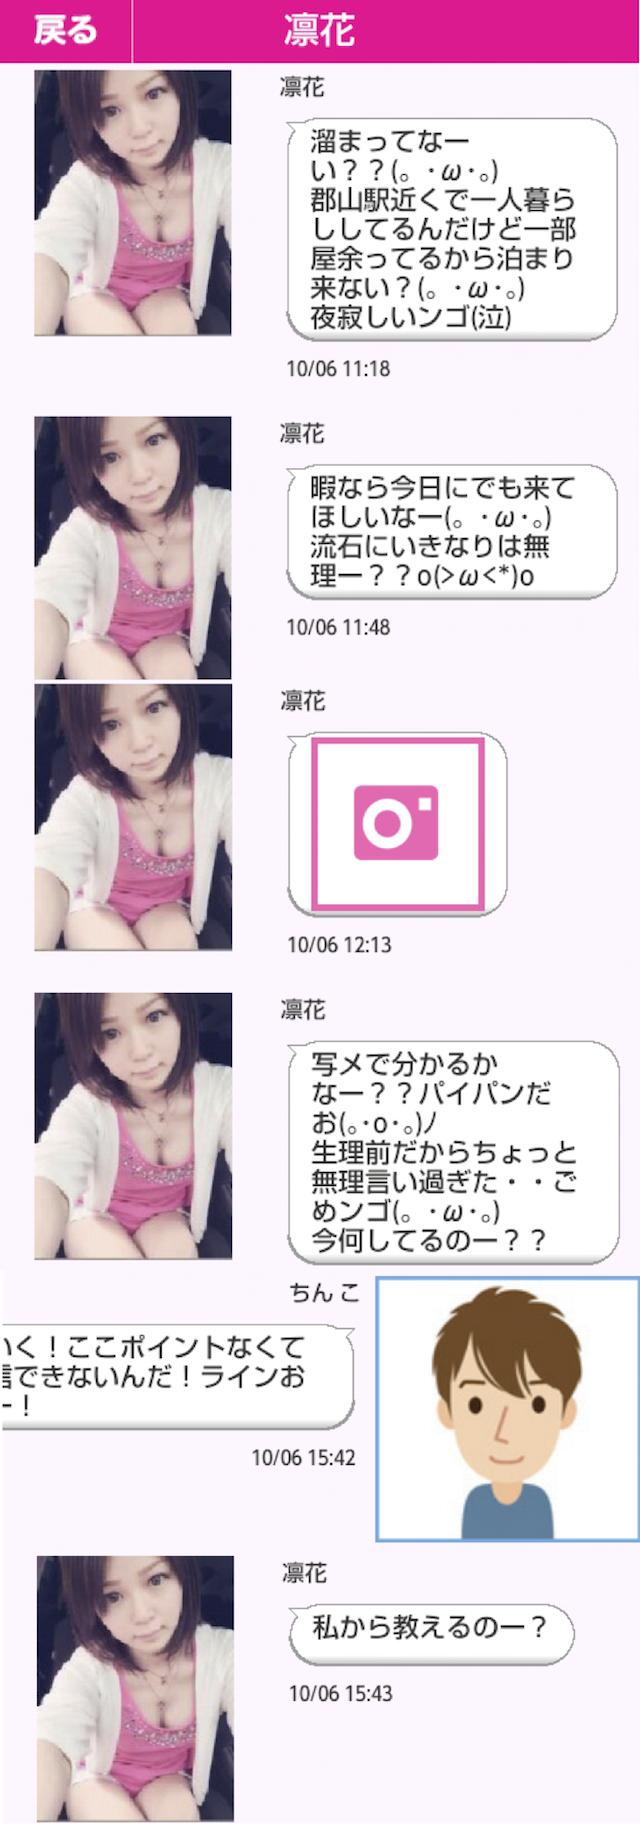 LOVEナビ_アプリ5